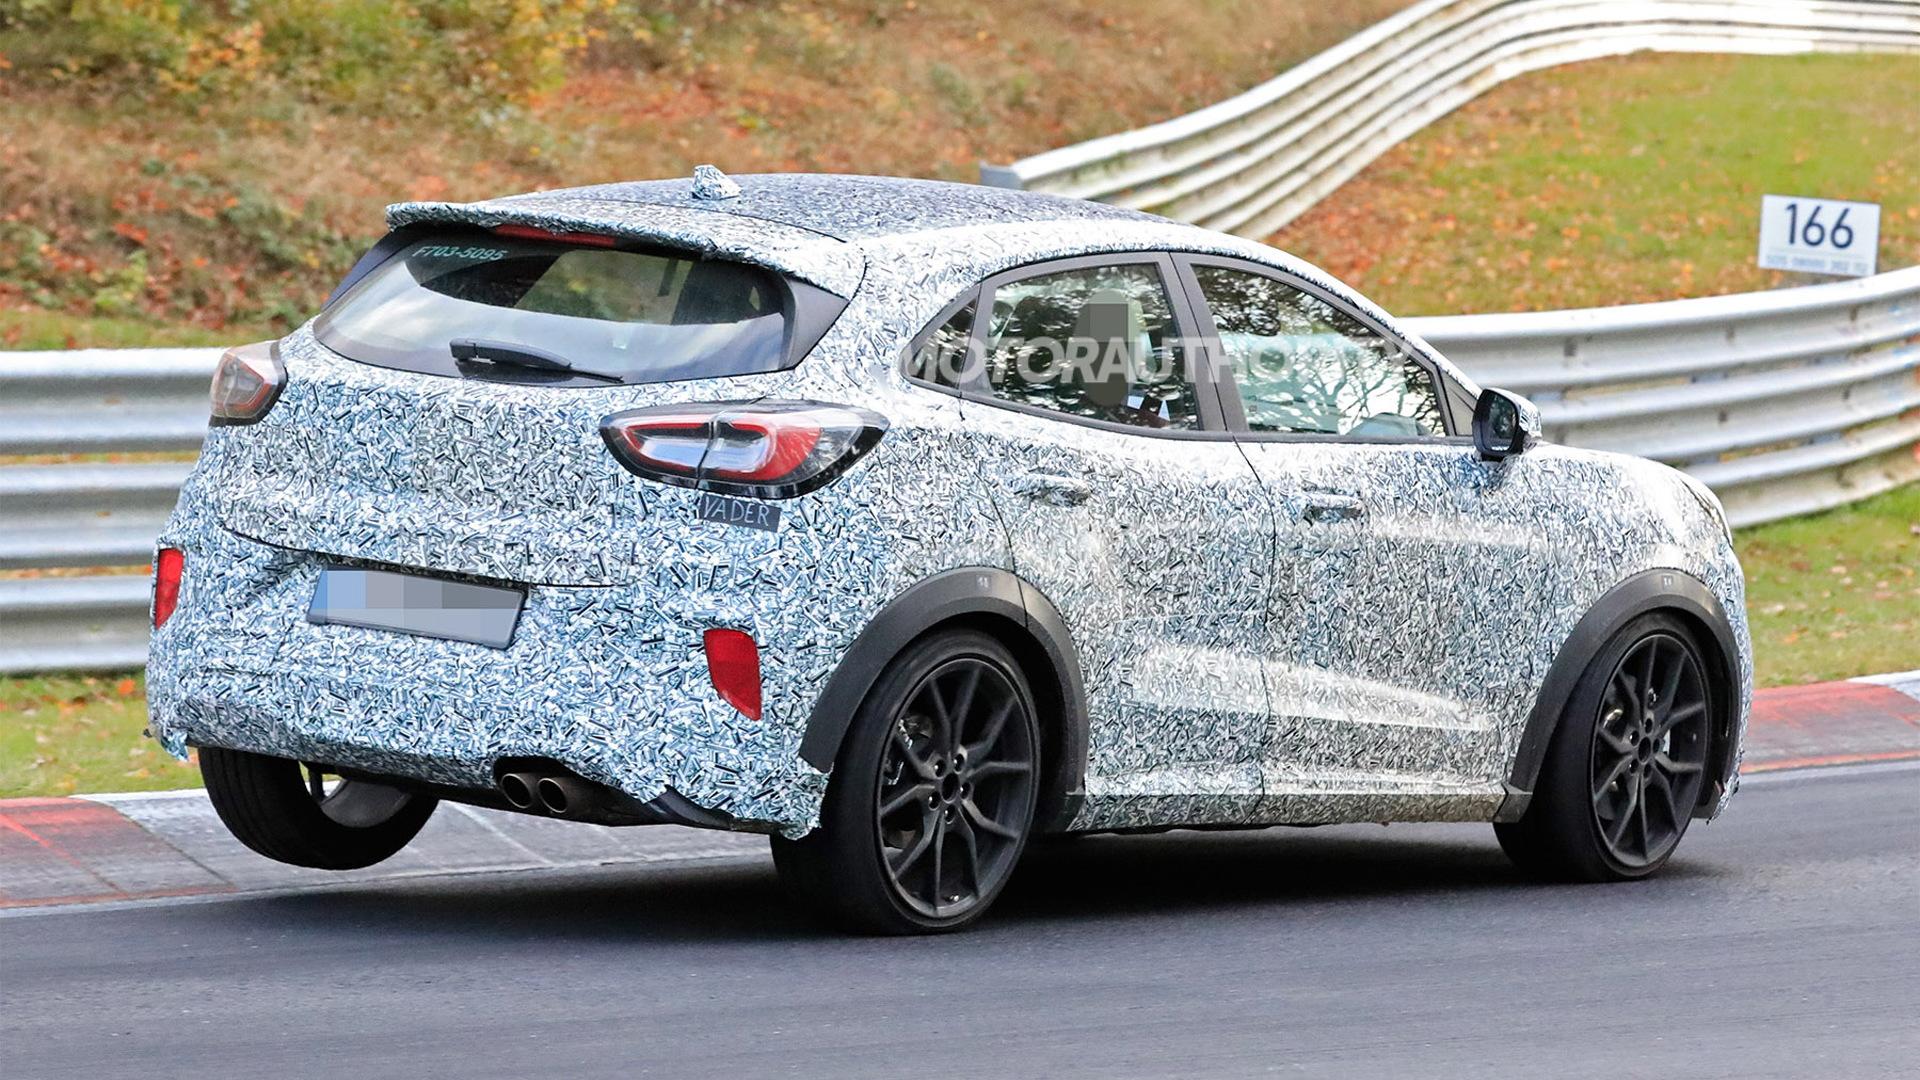 2020 Ford Puma ST spy shots - Photo credit: S. Baldauf/SB-Medien